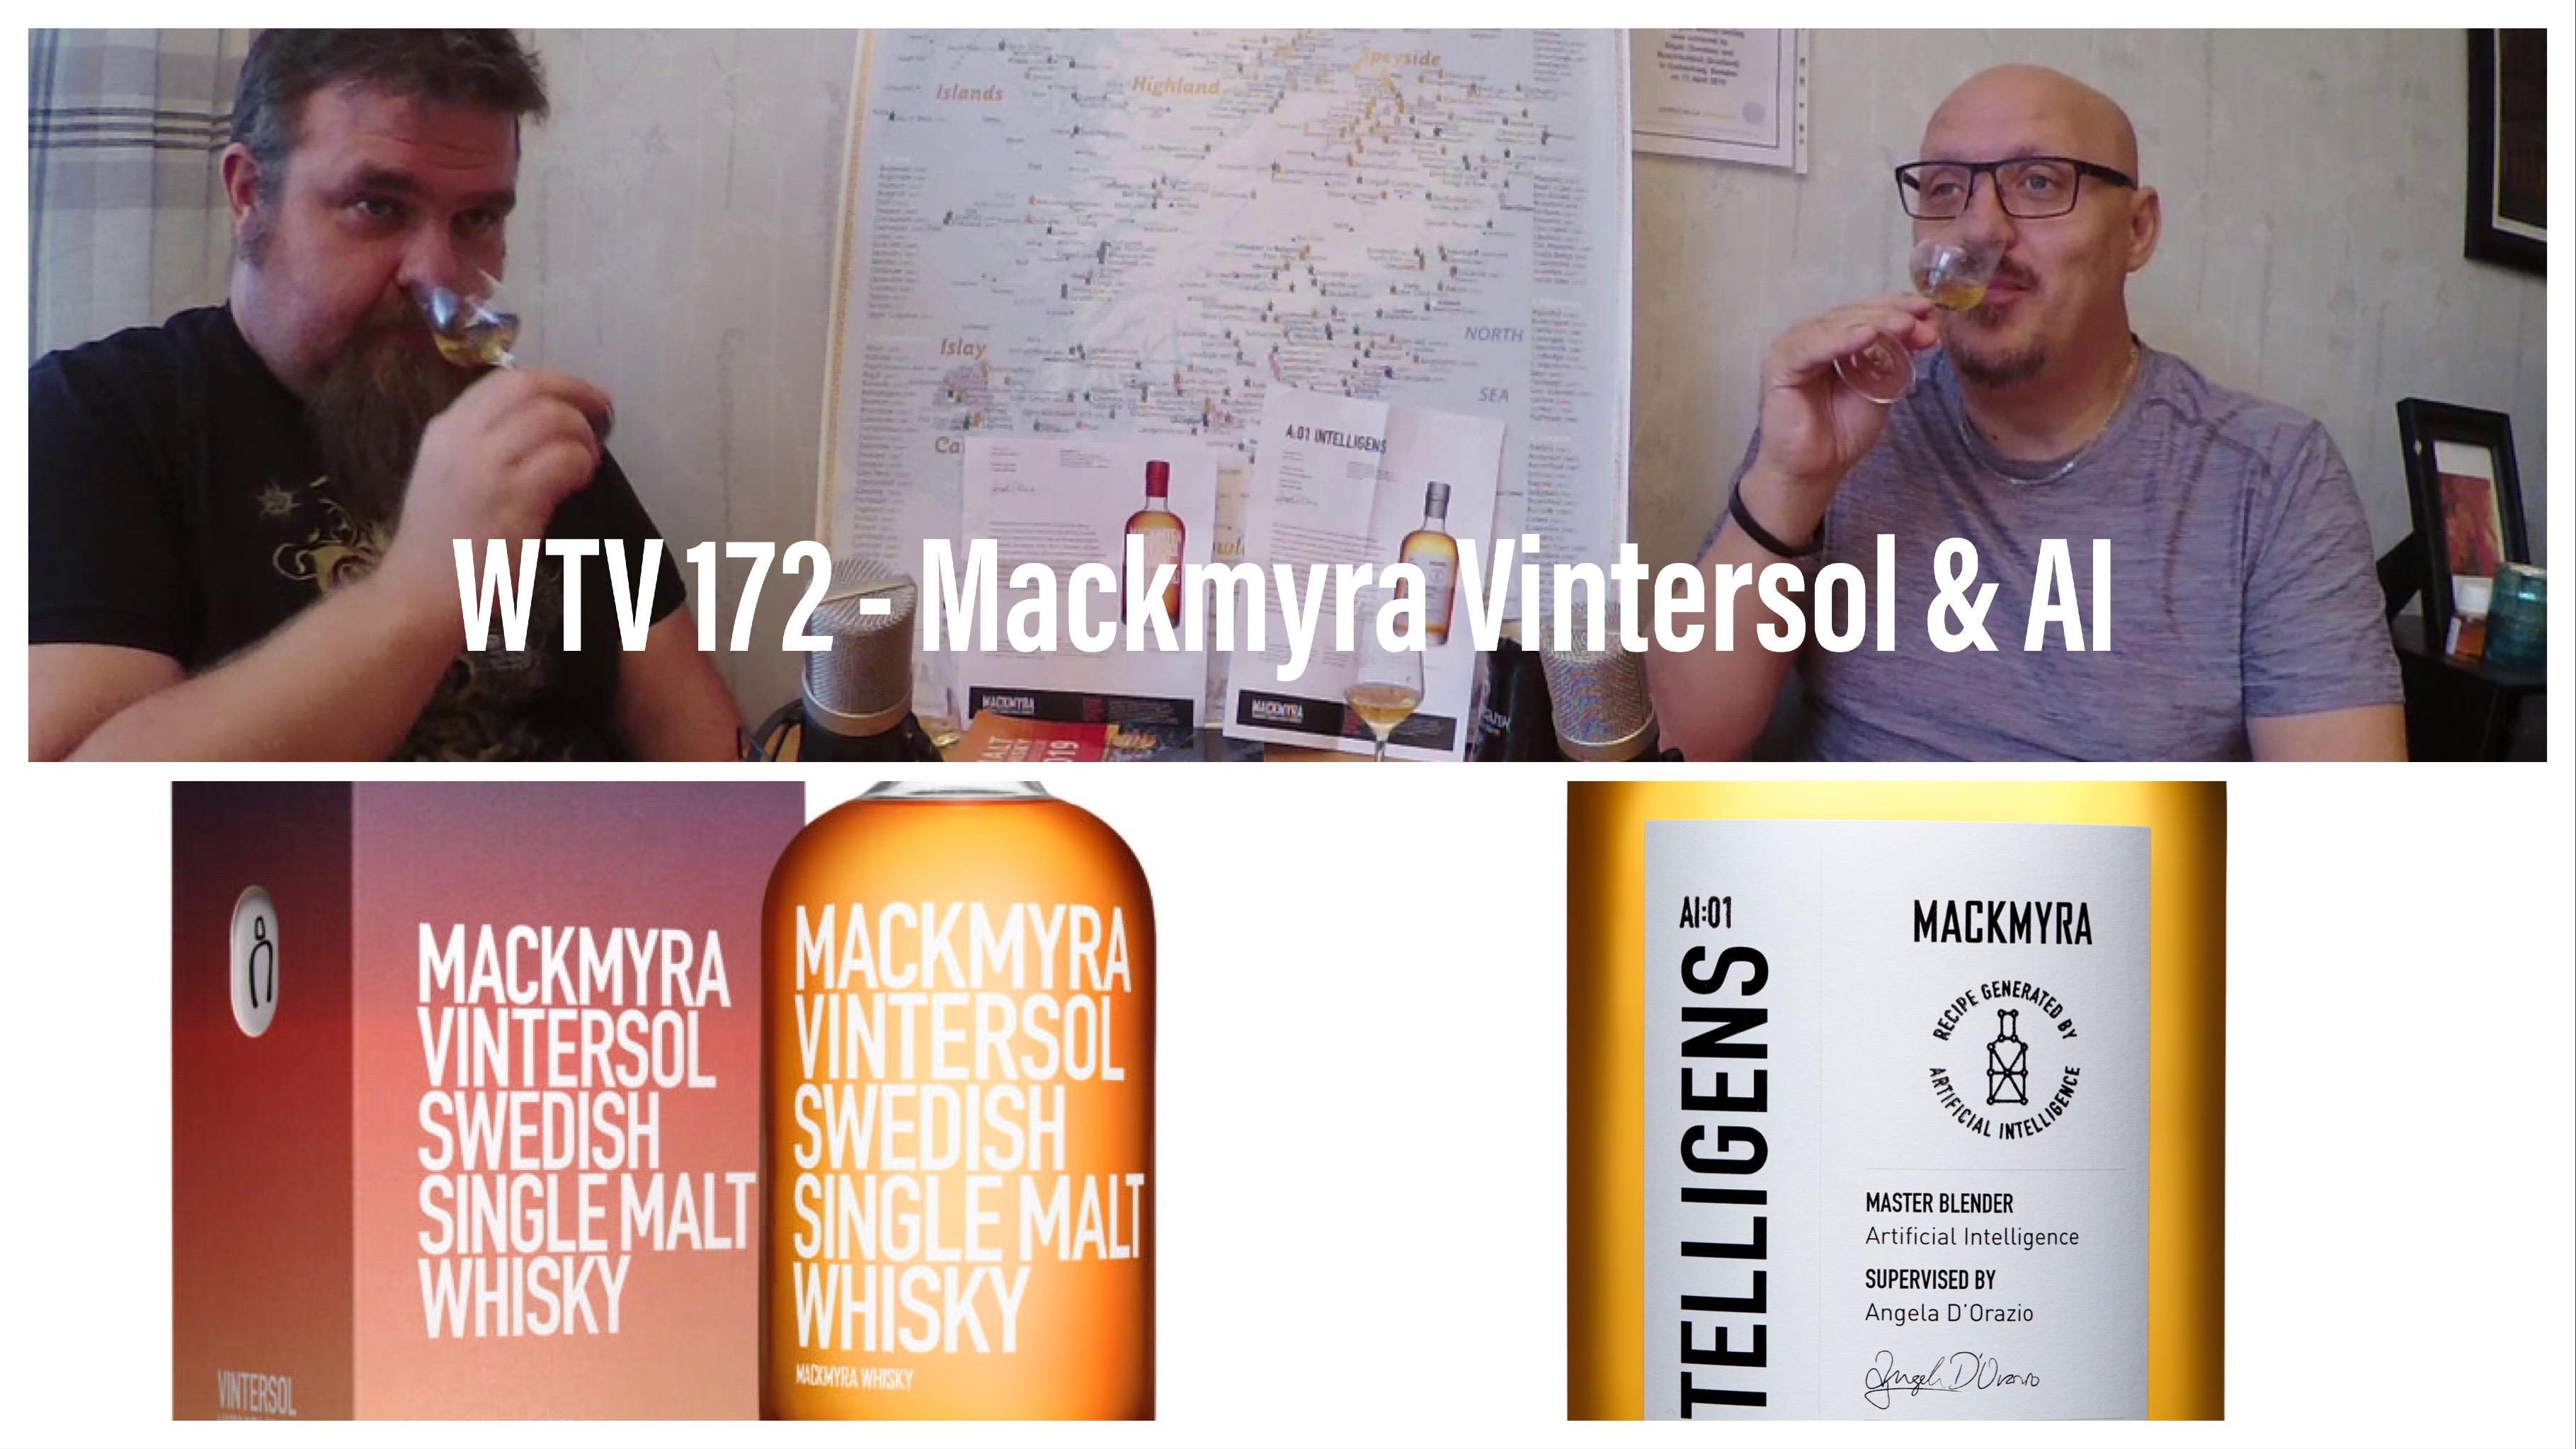 WTV 172 – Mackmyra AI & Vintersol